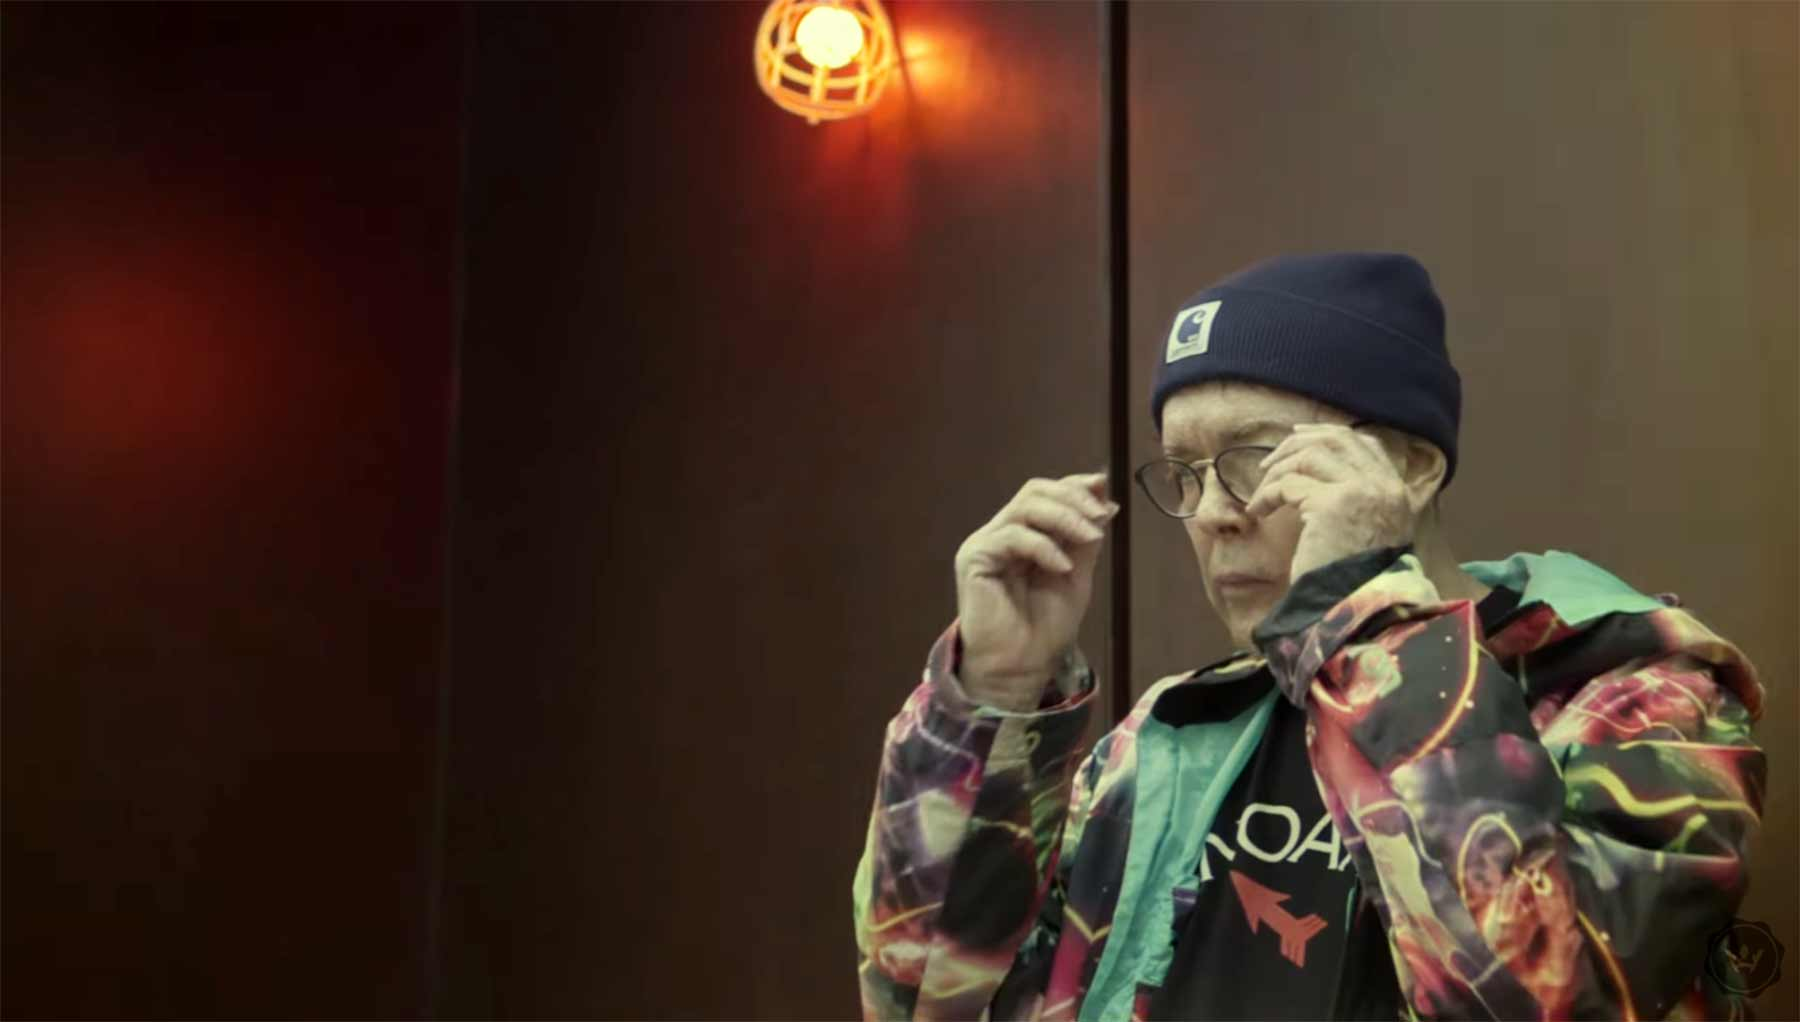 Der 73-jährige Charles Allcroft lebt Streetwear